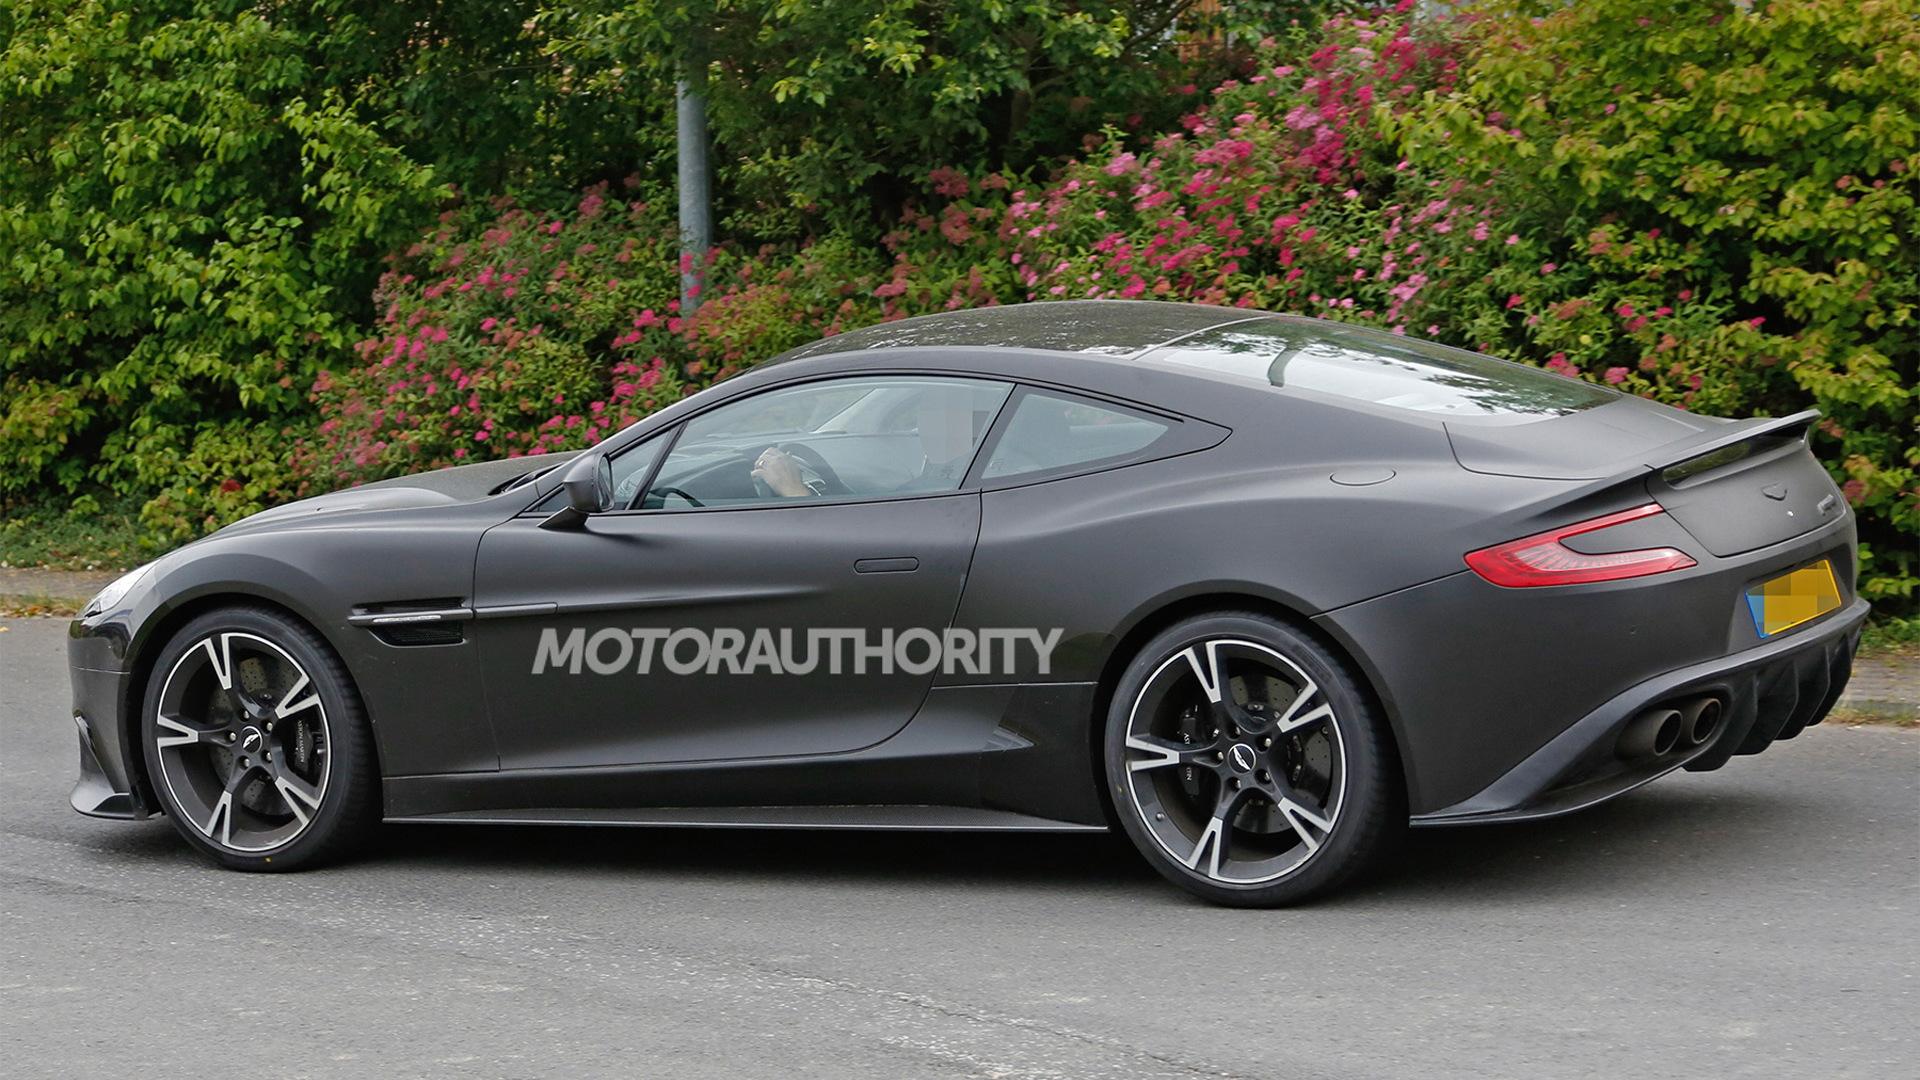 2018 Aston Martin Vanquish S spy shots - Image via S. Baldauf/SB-Medien